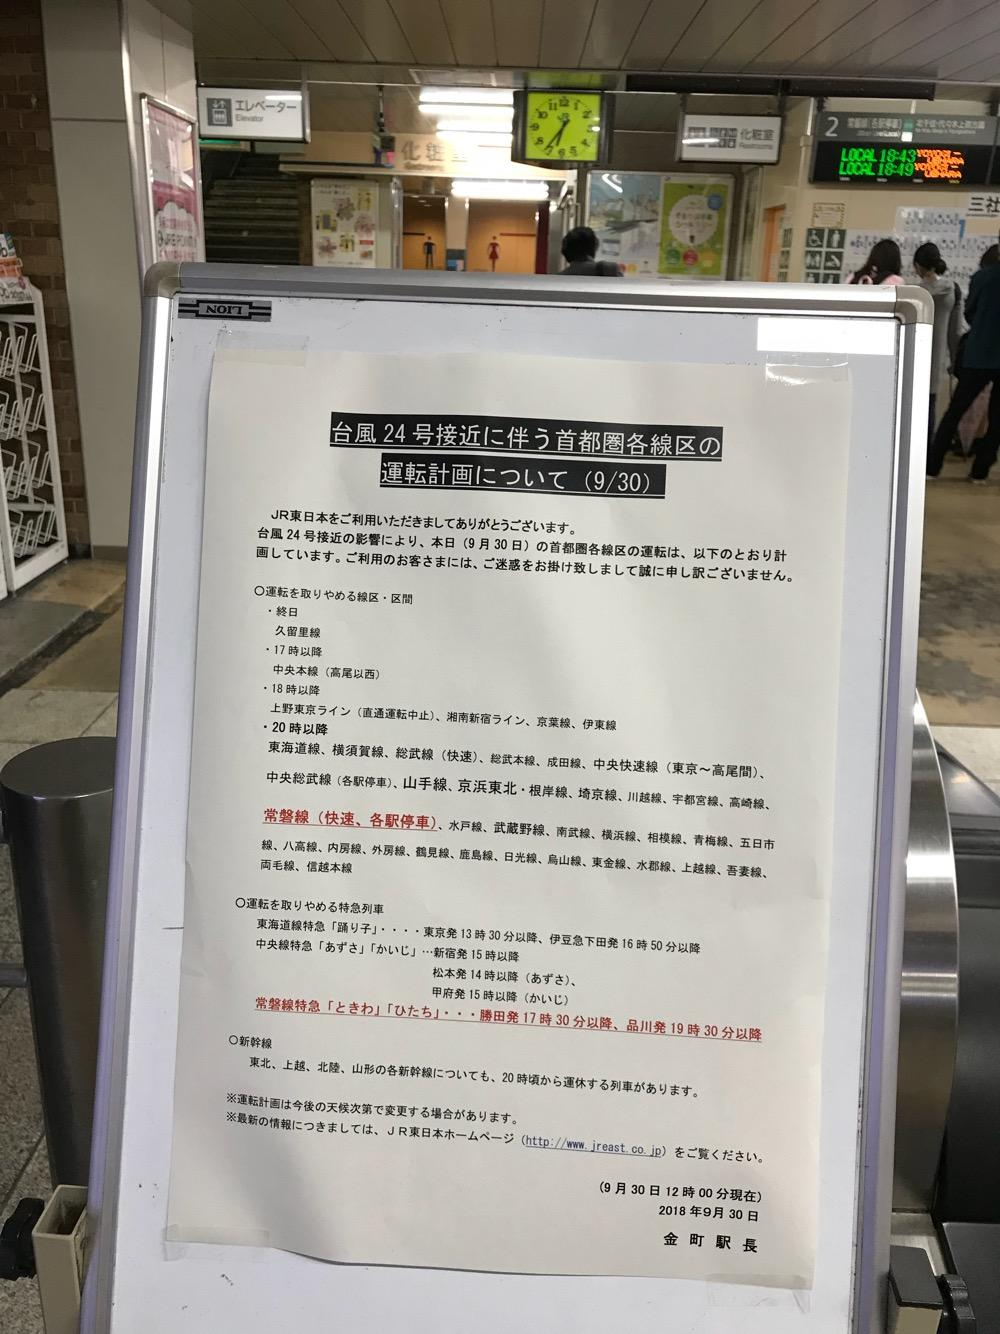 JR金町駅の改札口前に掲示された「台風24号接近に伴う首都圏各線区の運転計画について(9/30)」というお知らせ